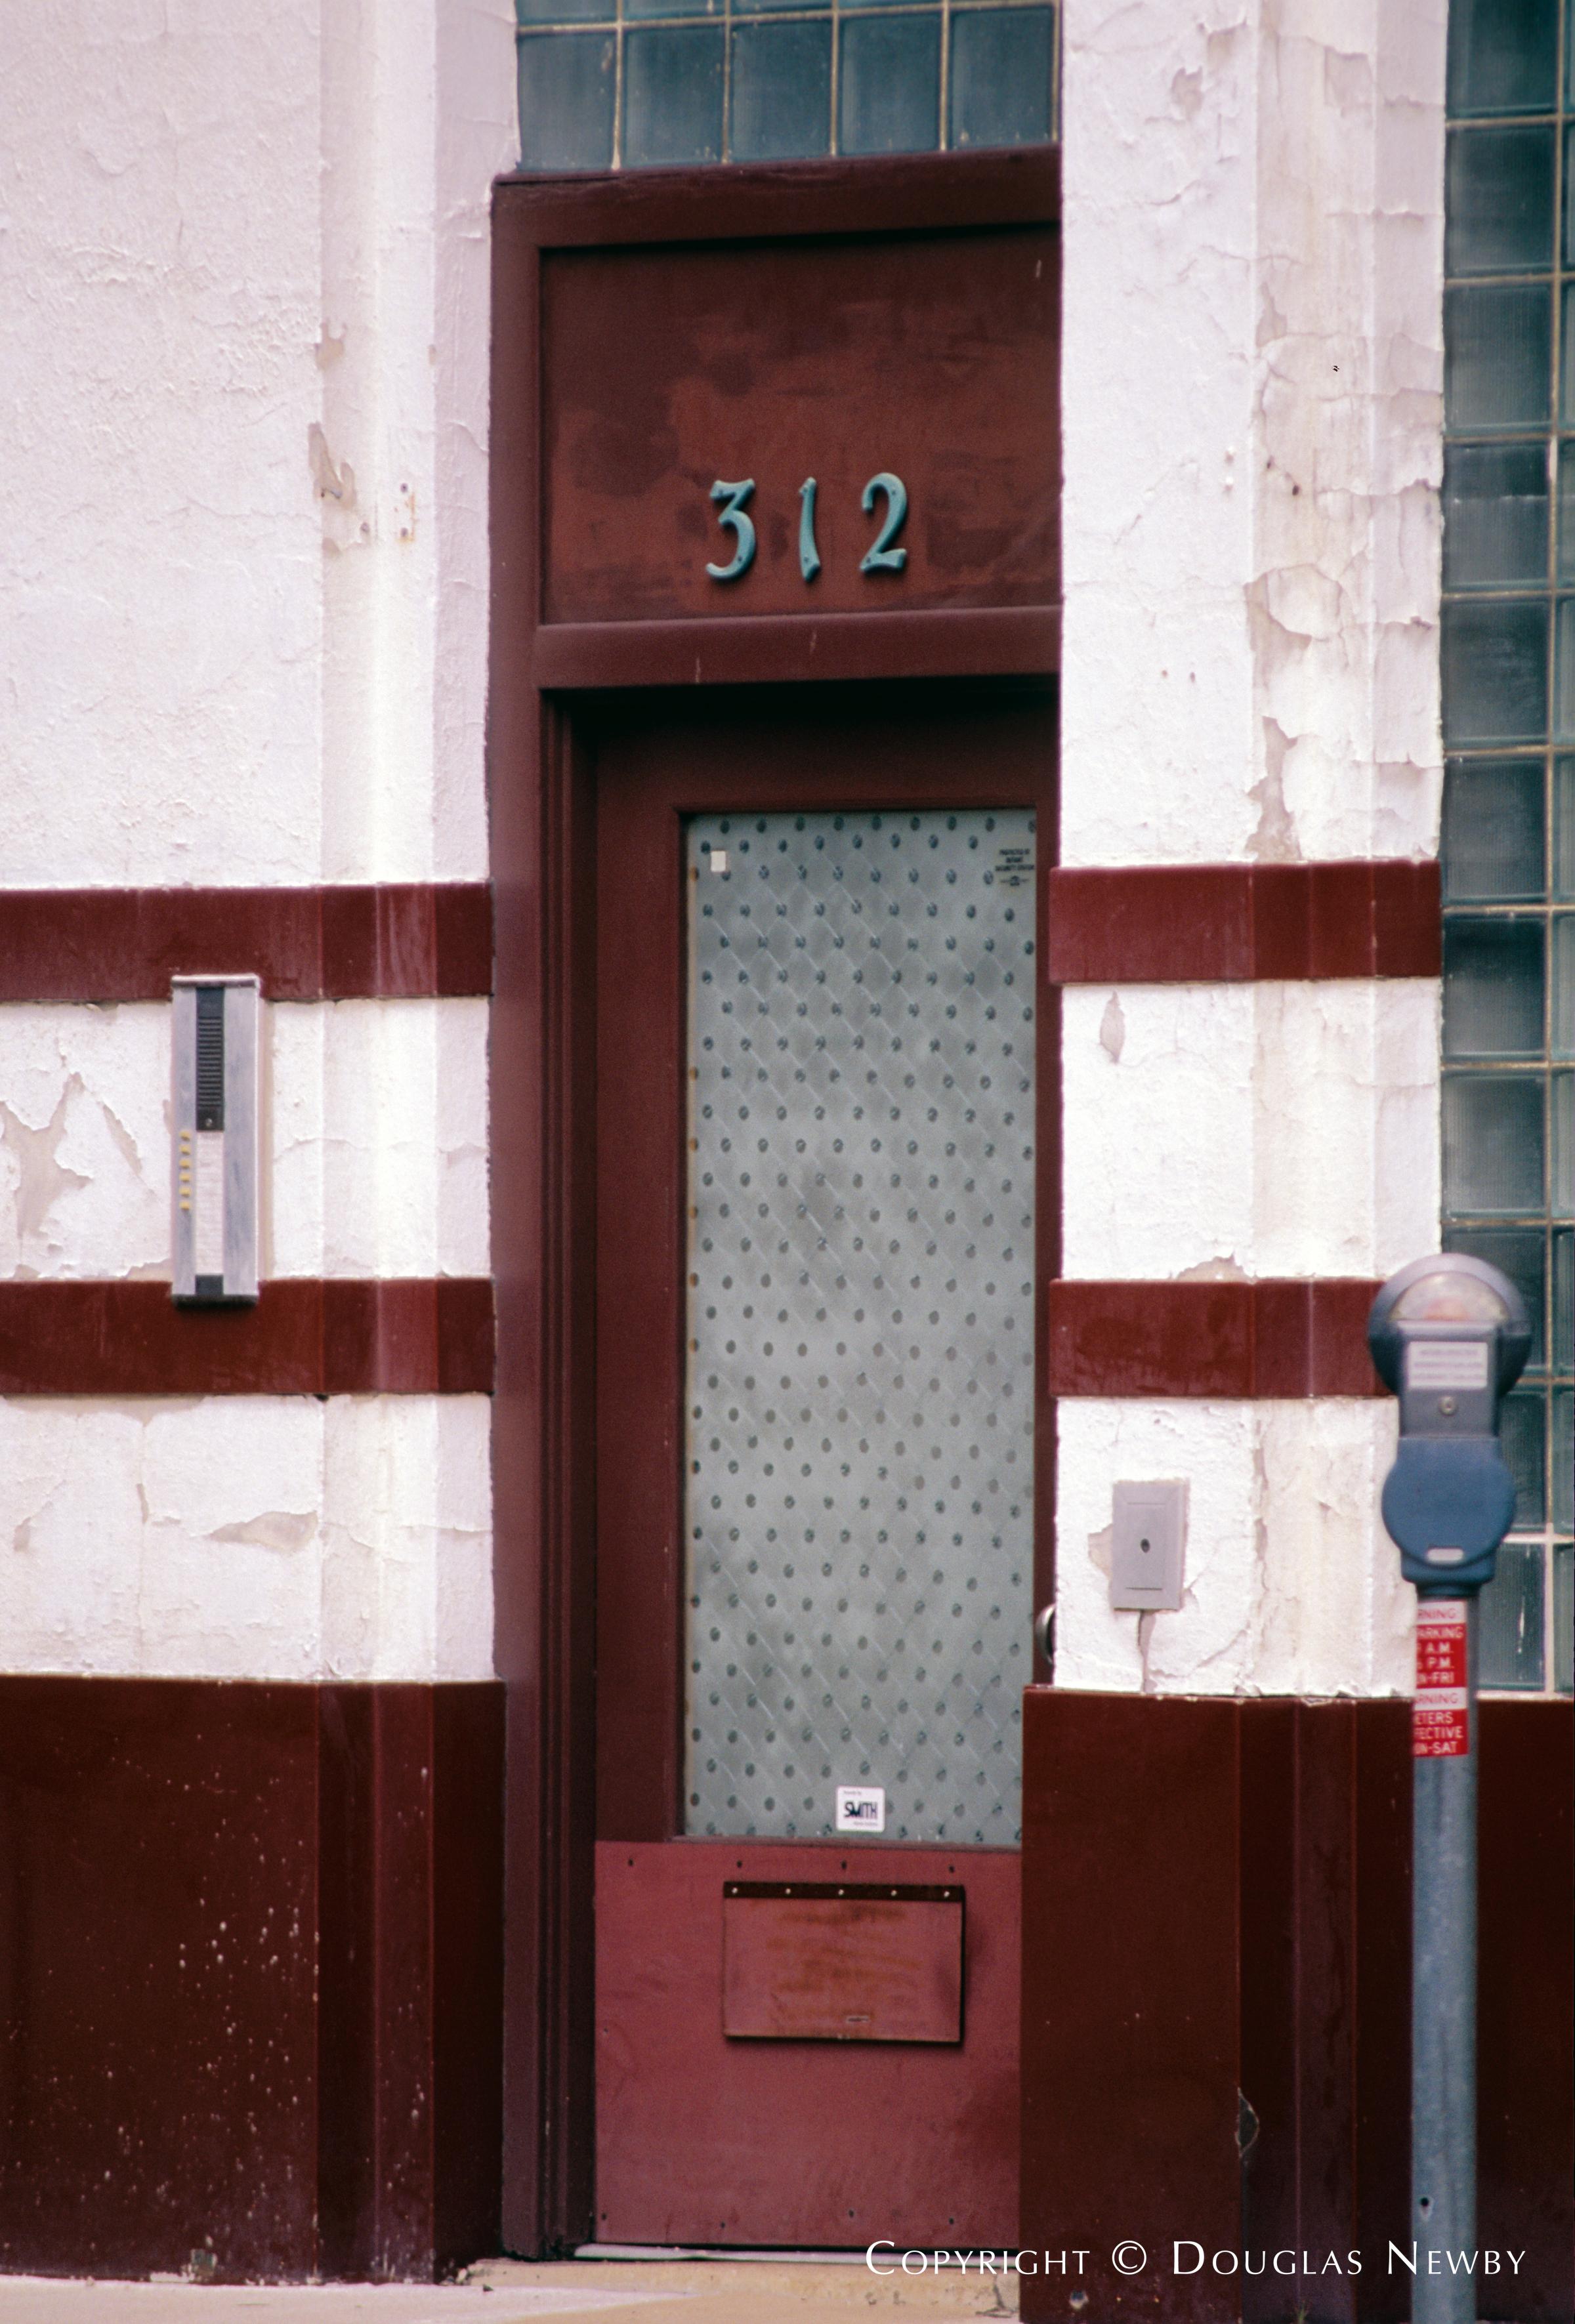 312 South Harwood Street, Dallas, Texas